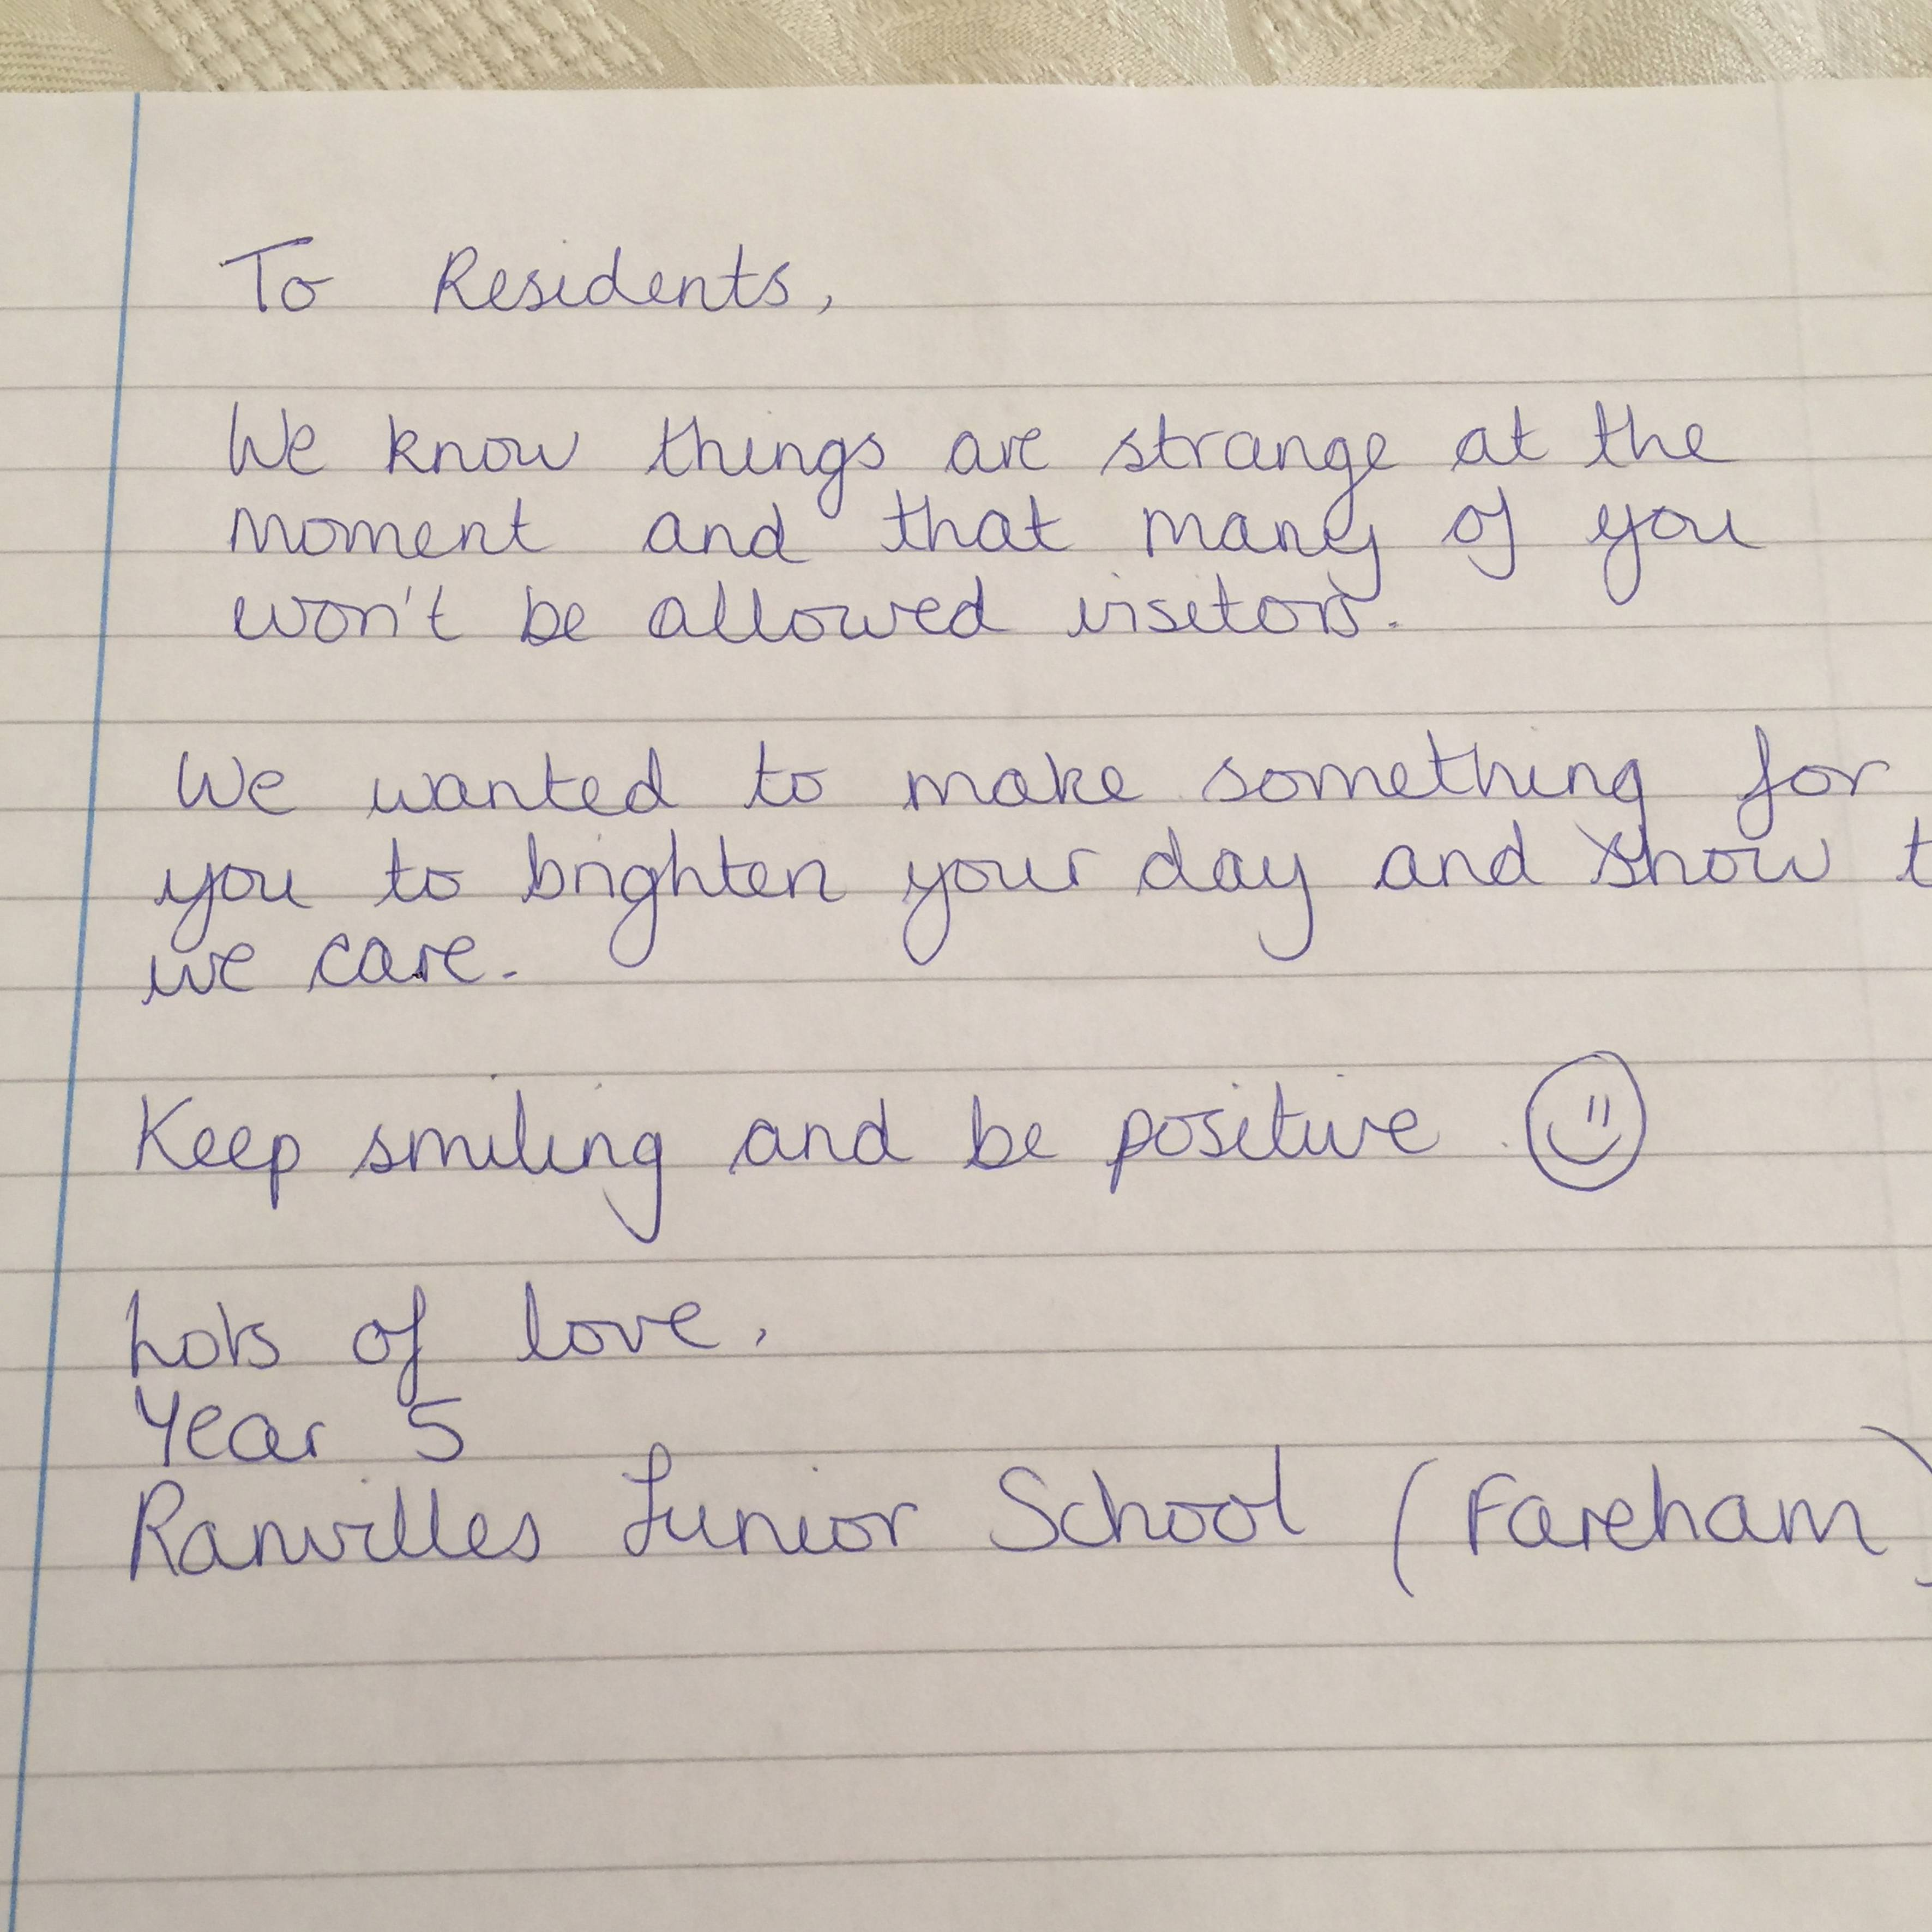 Message from Ranvilles Juniors